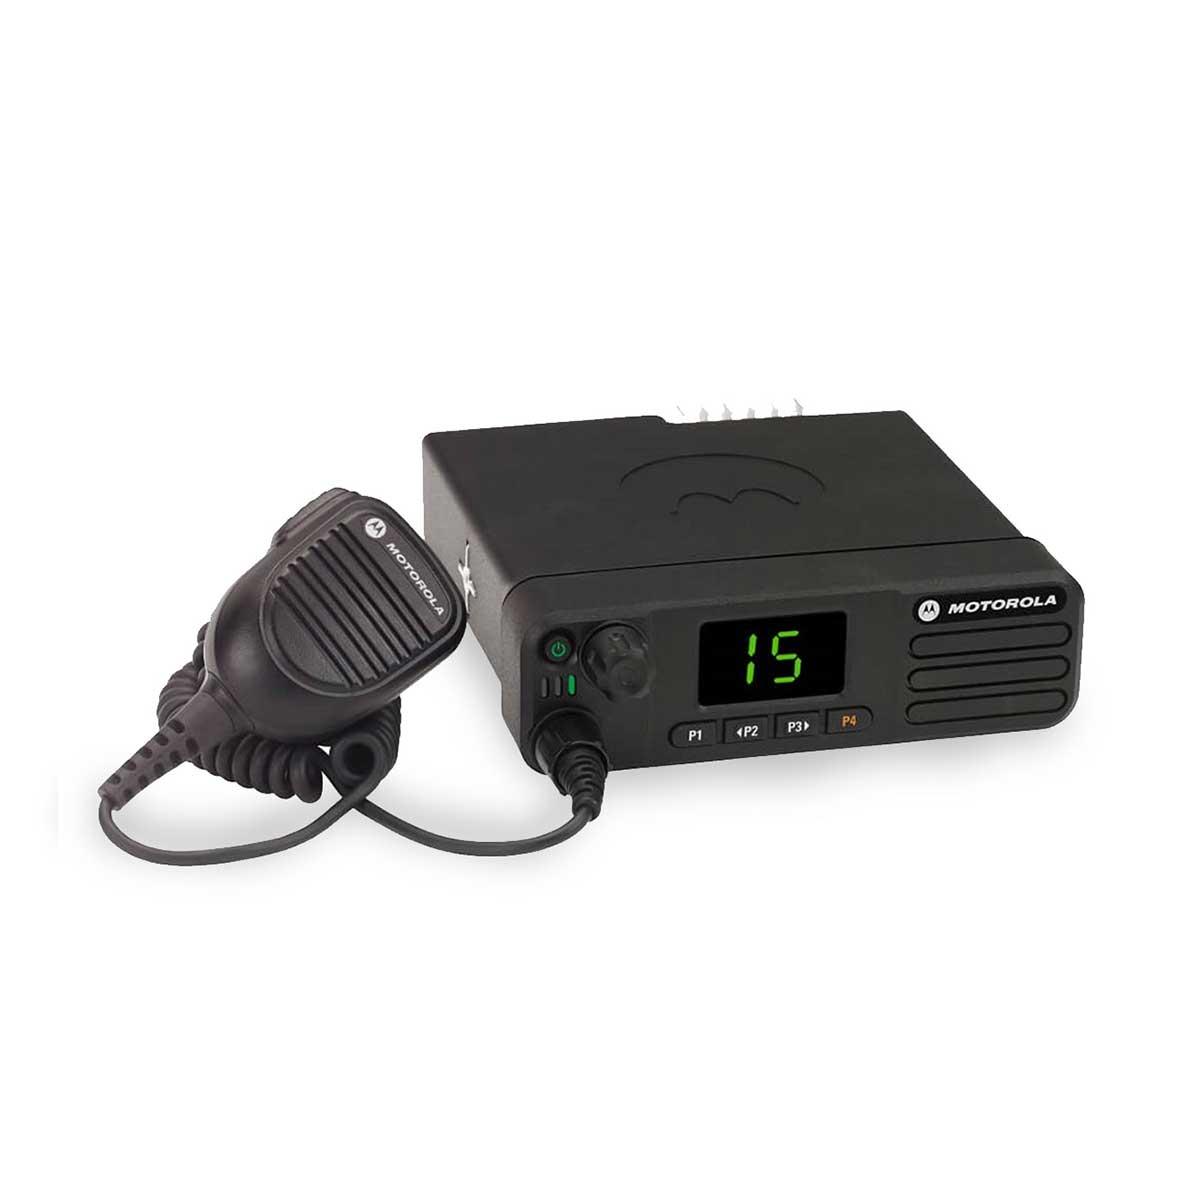 Radio Motorola DGM5000 Digital LAM28JNC9MA1AN VHF 136-174MHZ de 25W